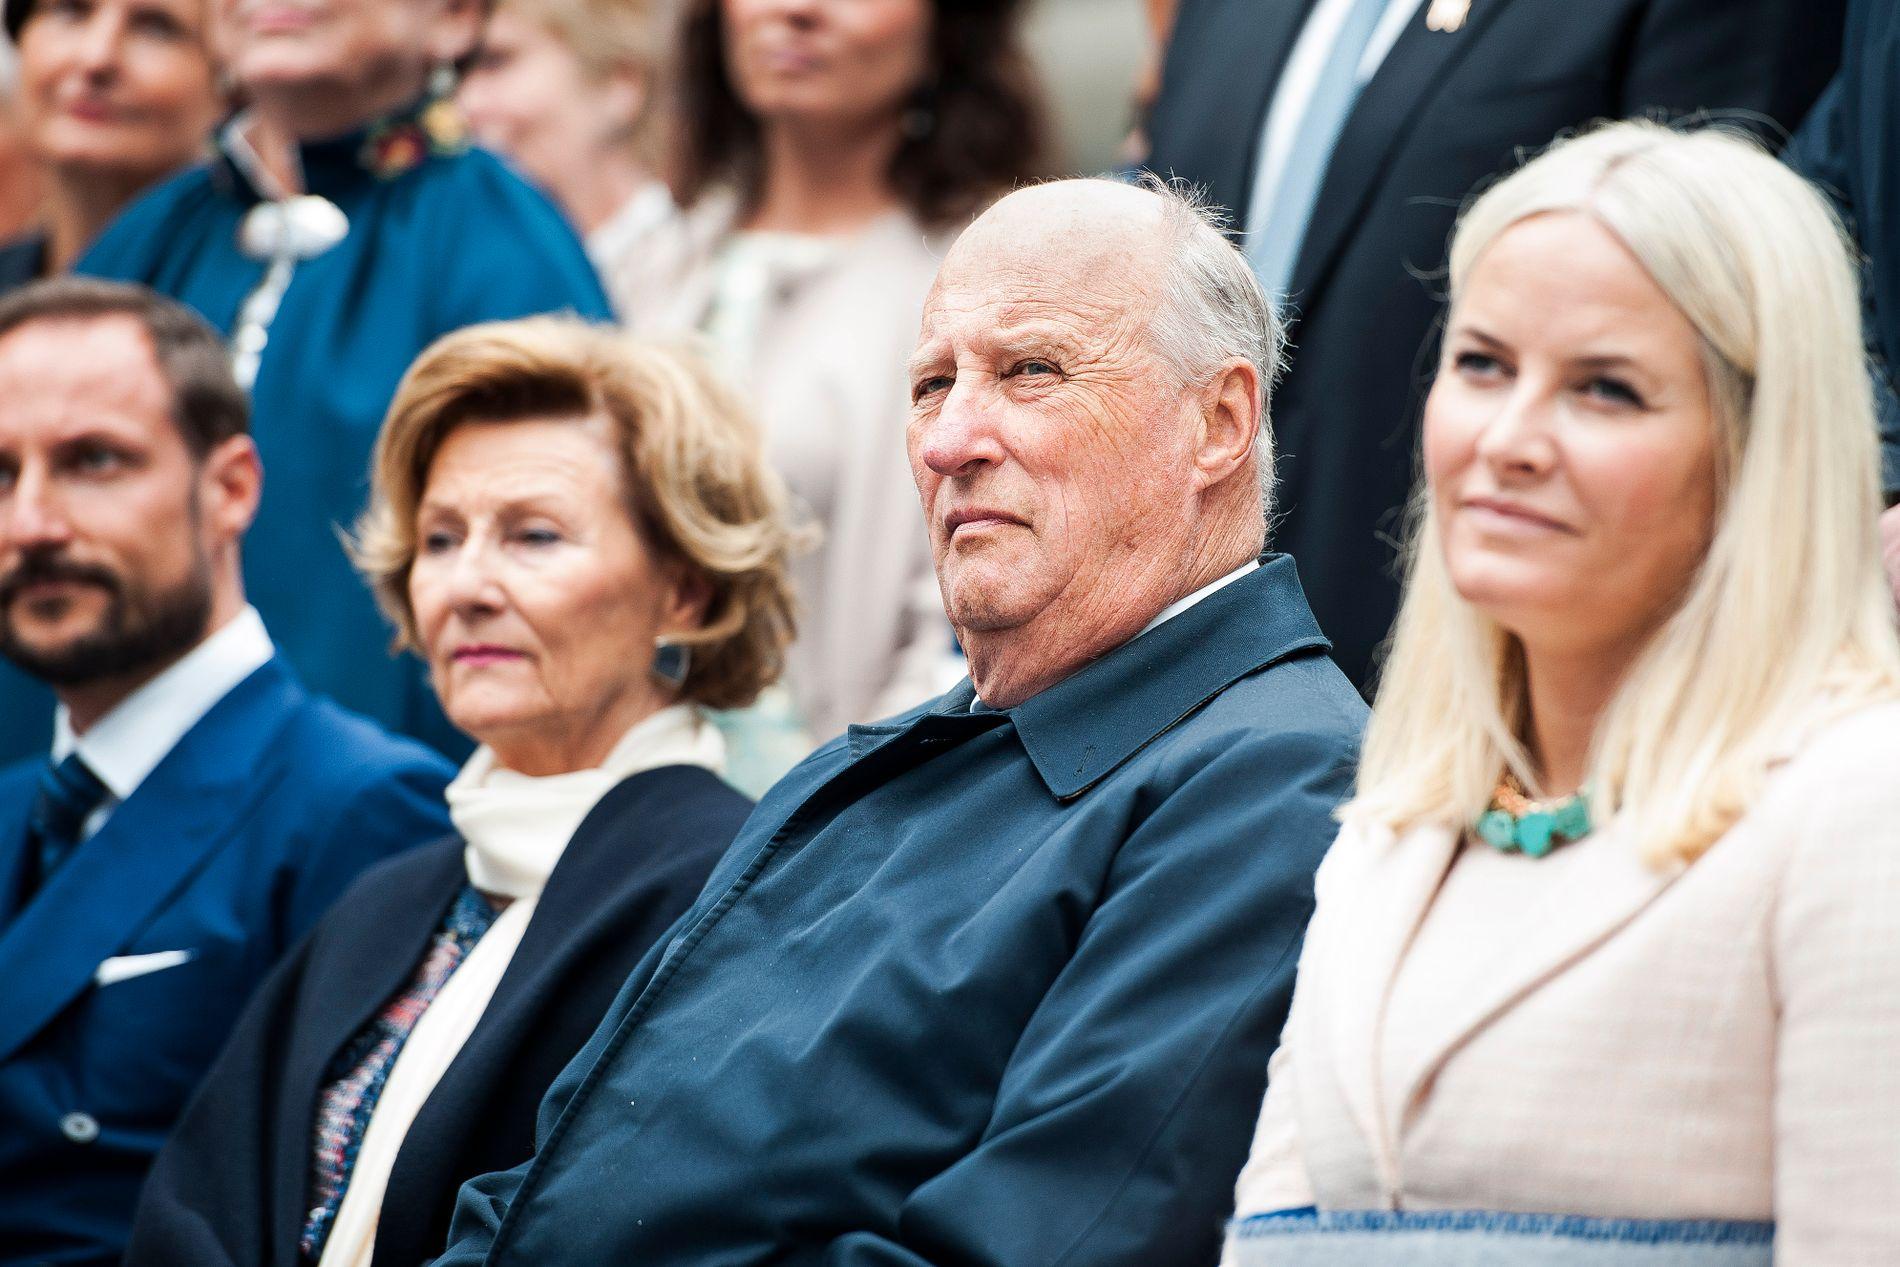 KONGELIG KVARTETT: Kronprins Haakon, dronning Sonja, kong Harald og kronprinsesse Mette-Marit, her på hagefest på Ledaal i Stavanger for en tid siden.